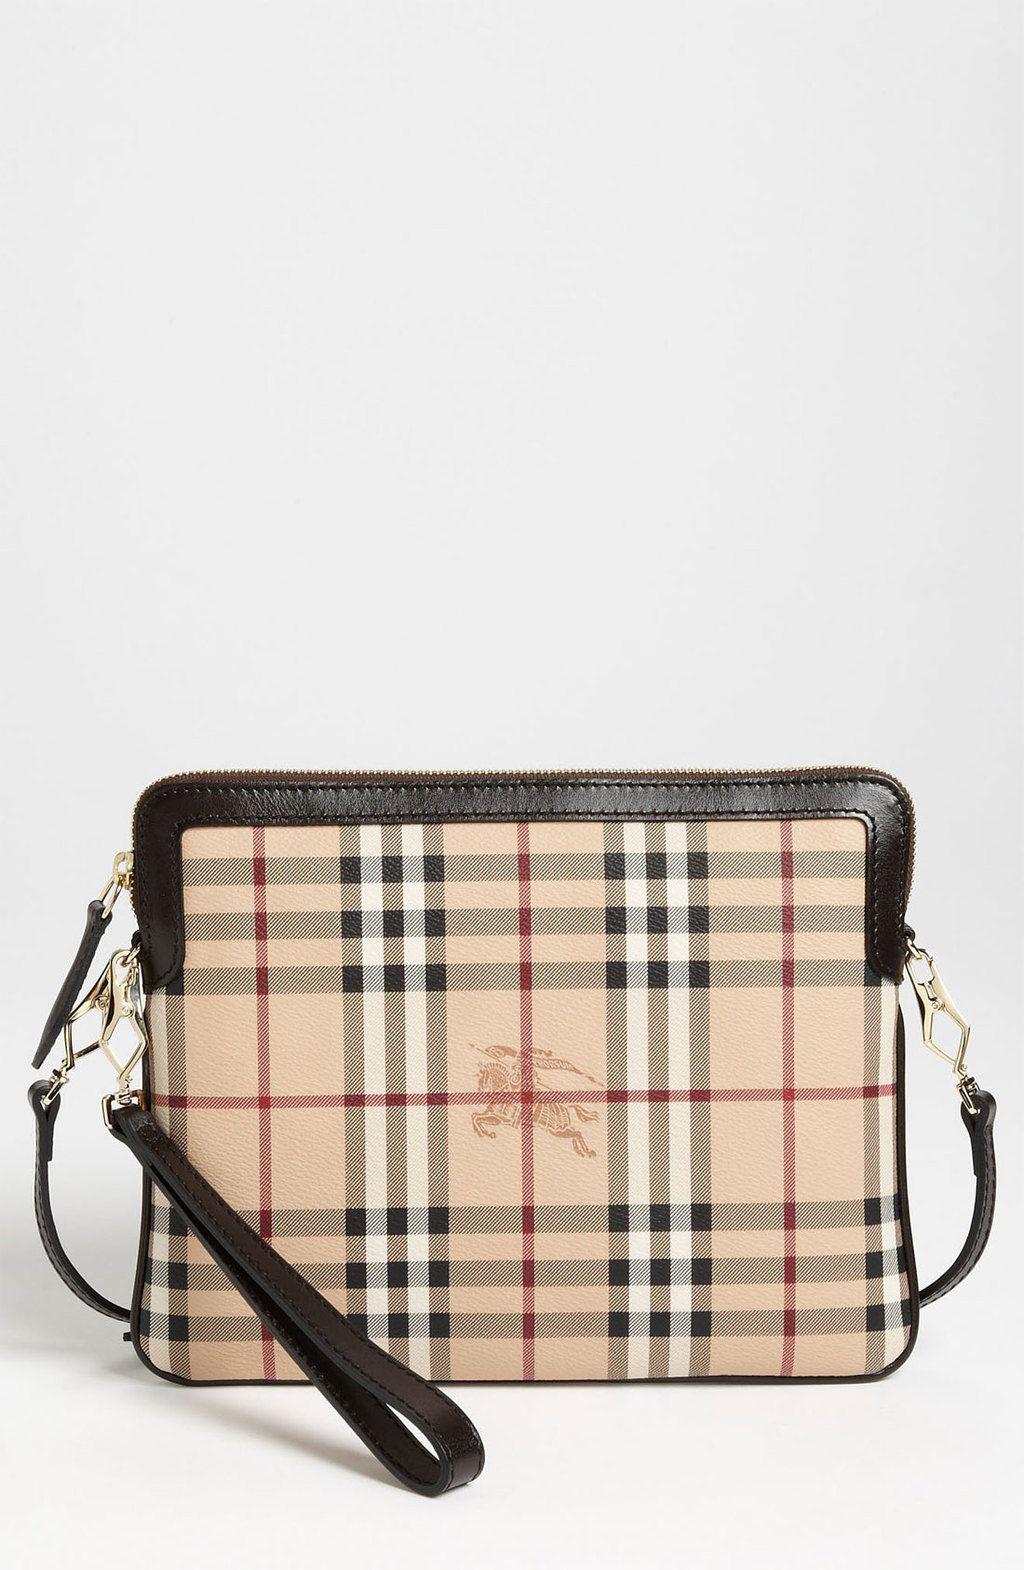 3d0e75243ee8 Burberry - Brown Prorsum Haymarket Check Ipad Crossbody Bag